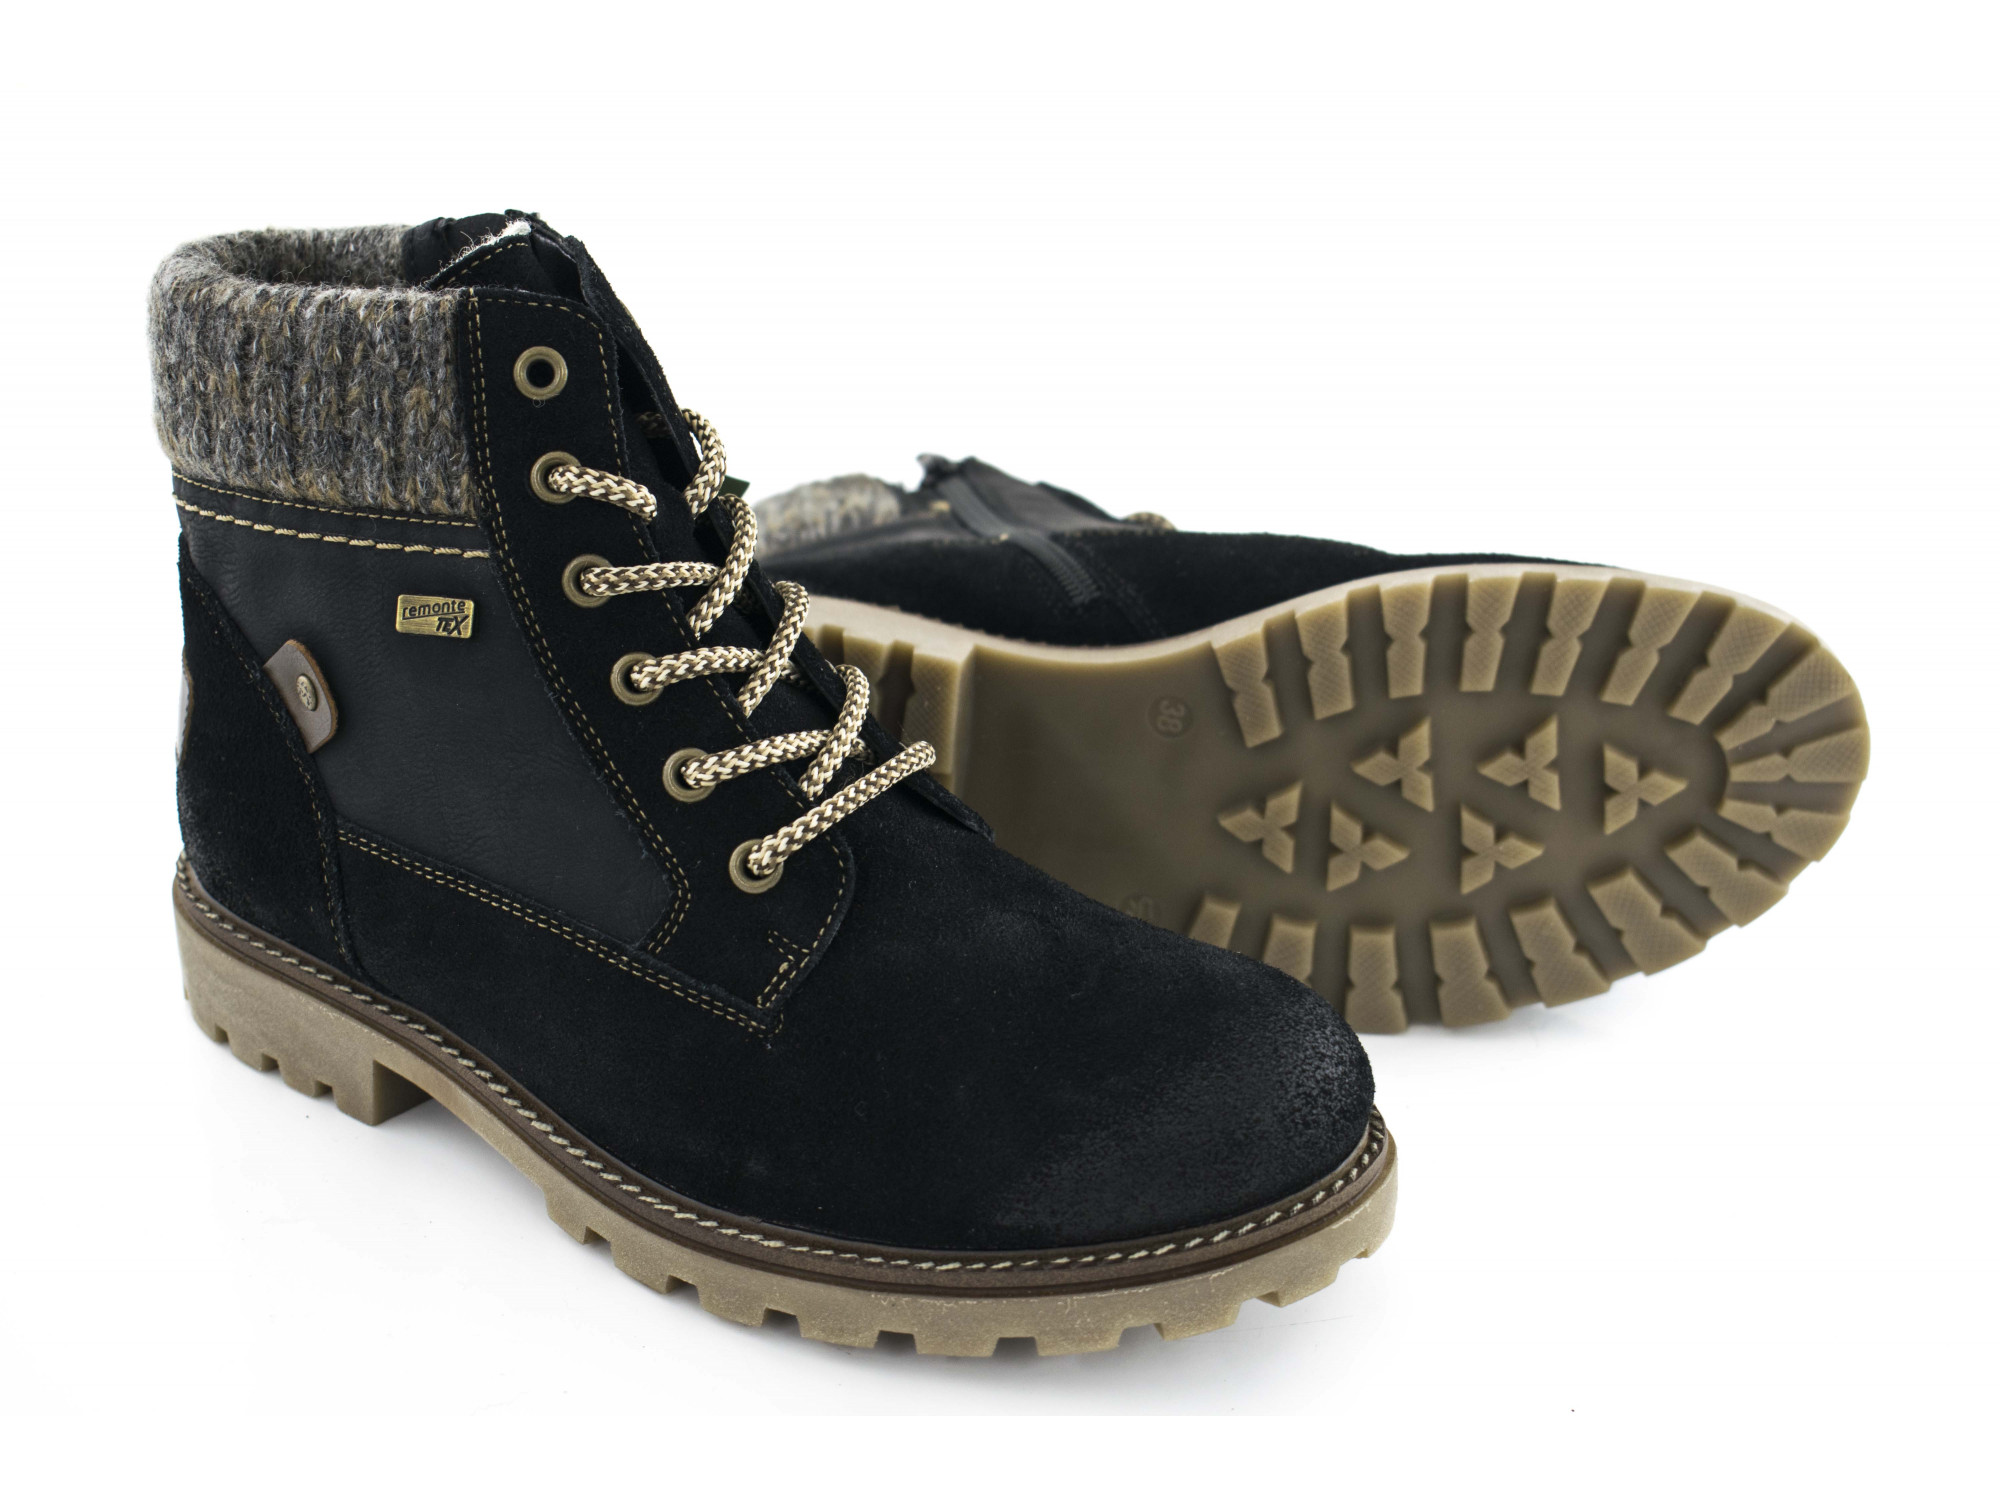 Ботинки Remonte d7466-02